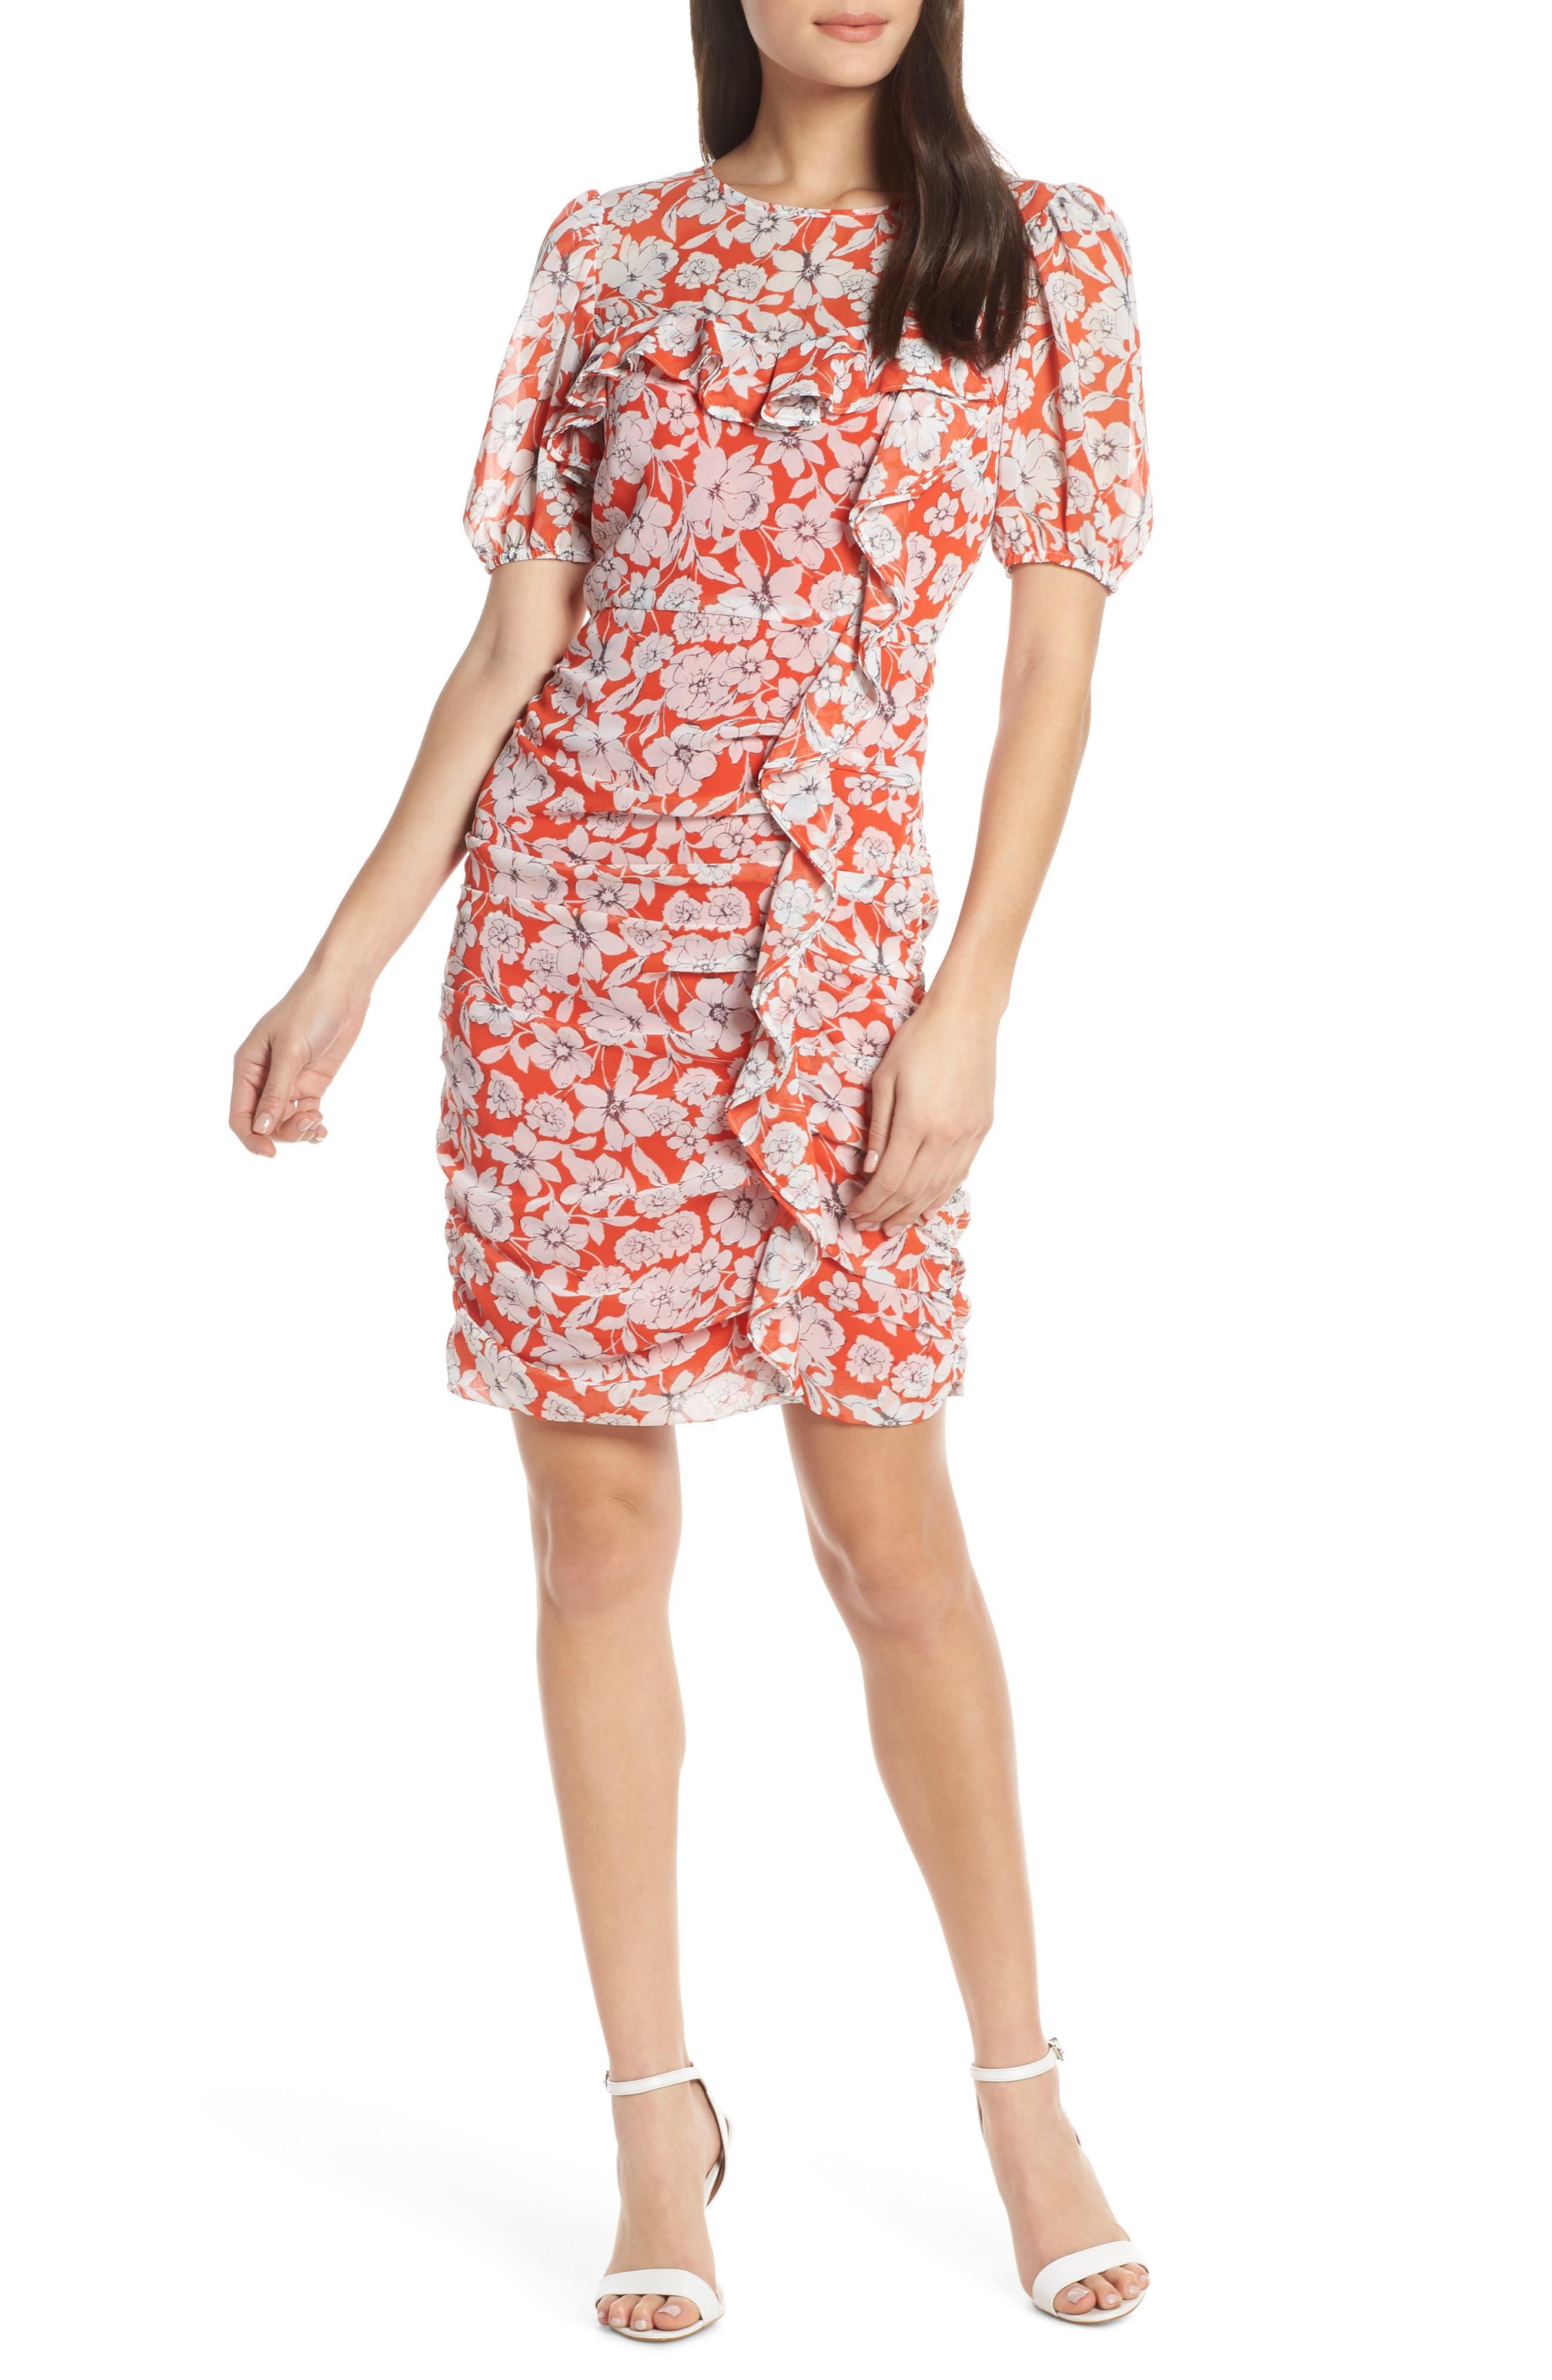 Petite Chelsea28 Floral Print Ruched Sheath Dress, Orange